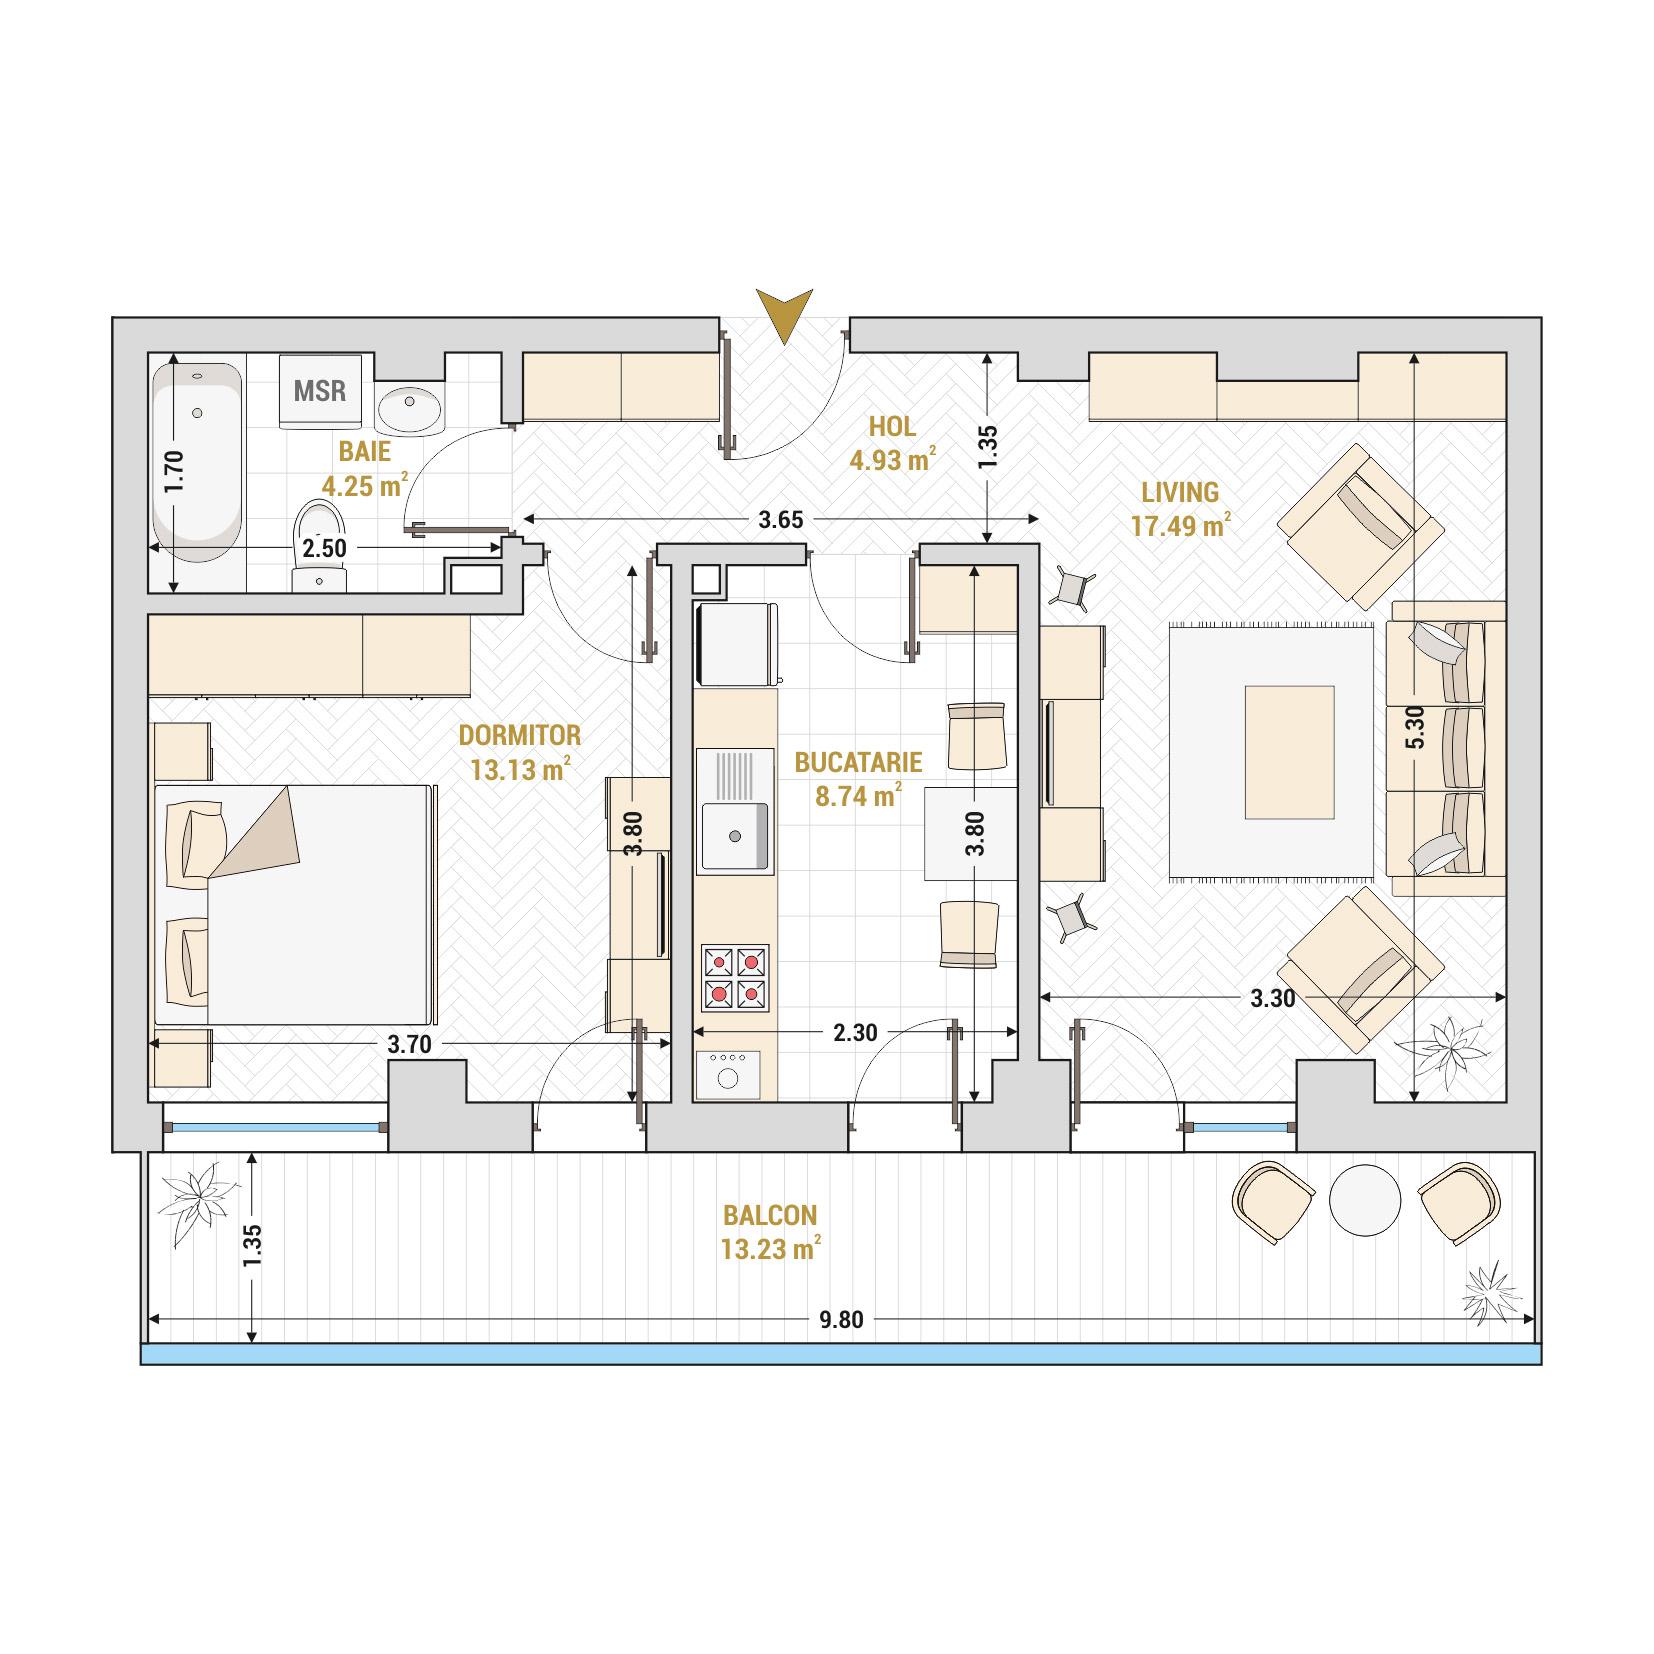 Apartament 2 camere de vanzare Bucuresti - Catedral Residence - Marriott, Piata Unirii, 13 Septembrie, Izvor - Tip 2 - T2